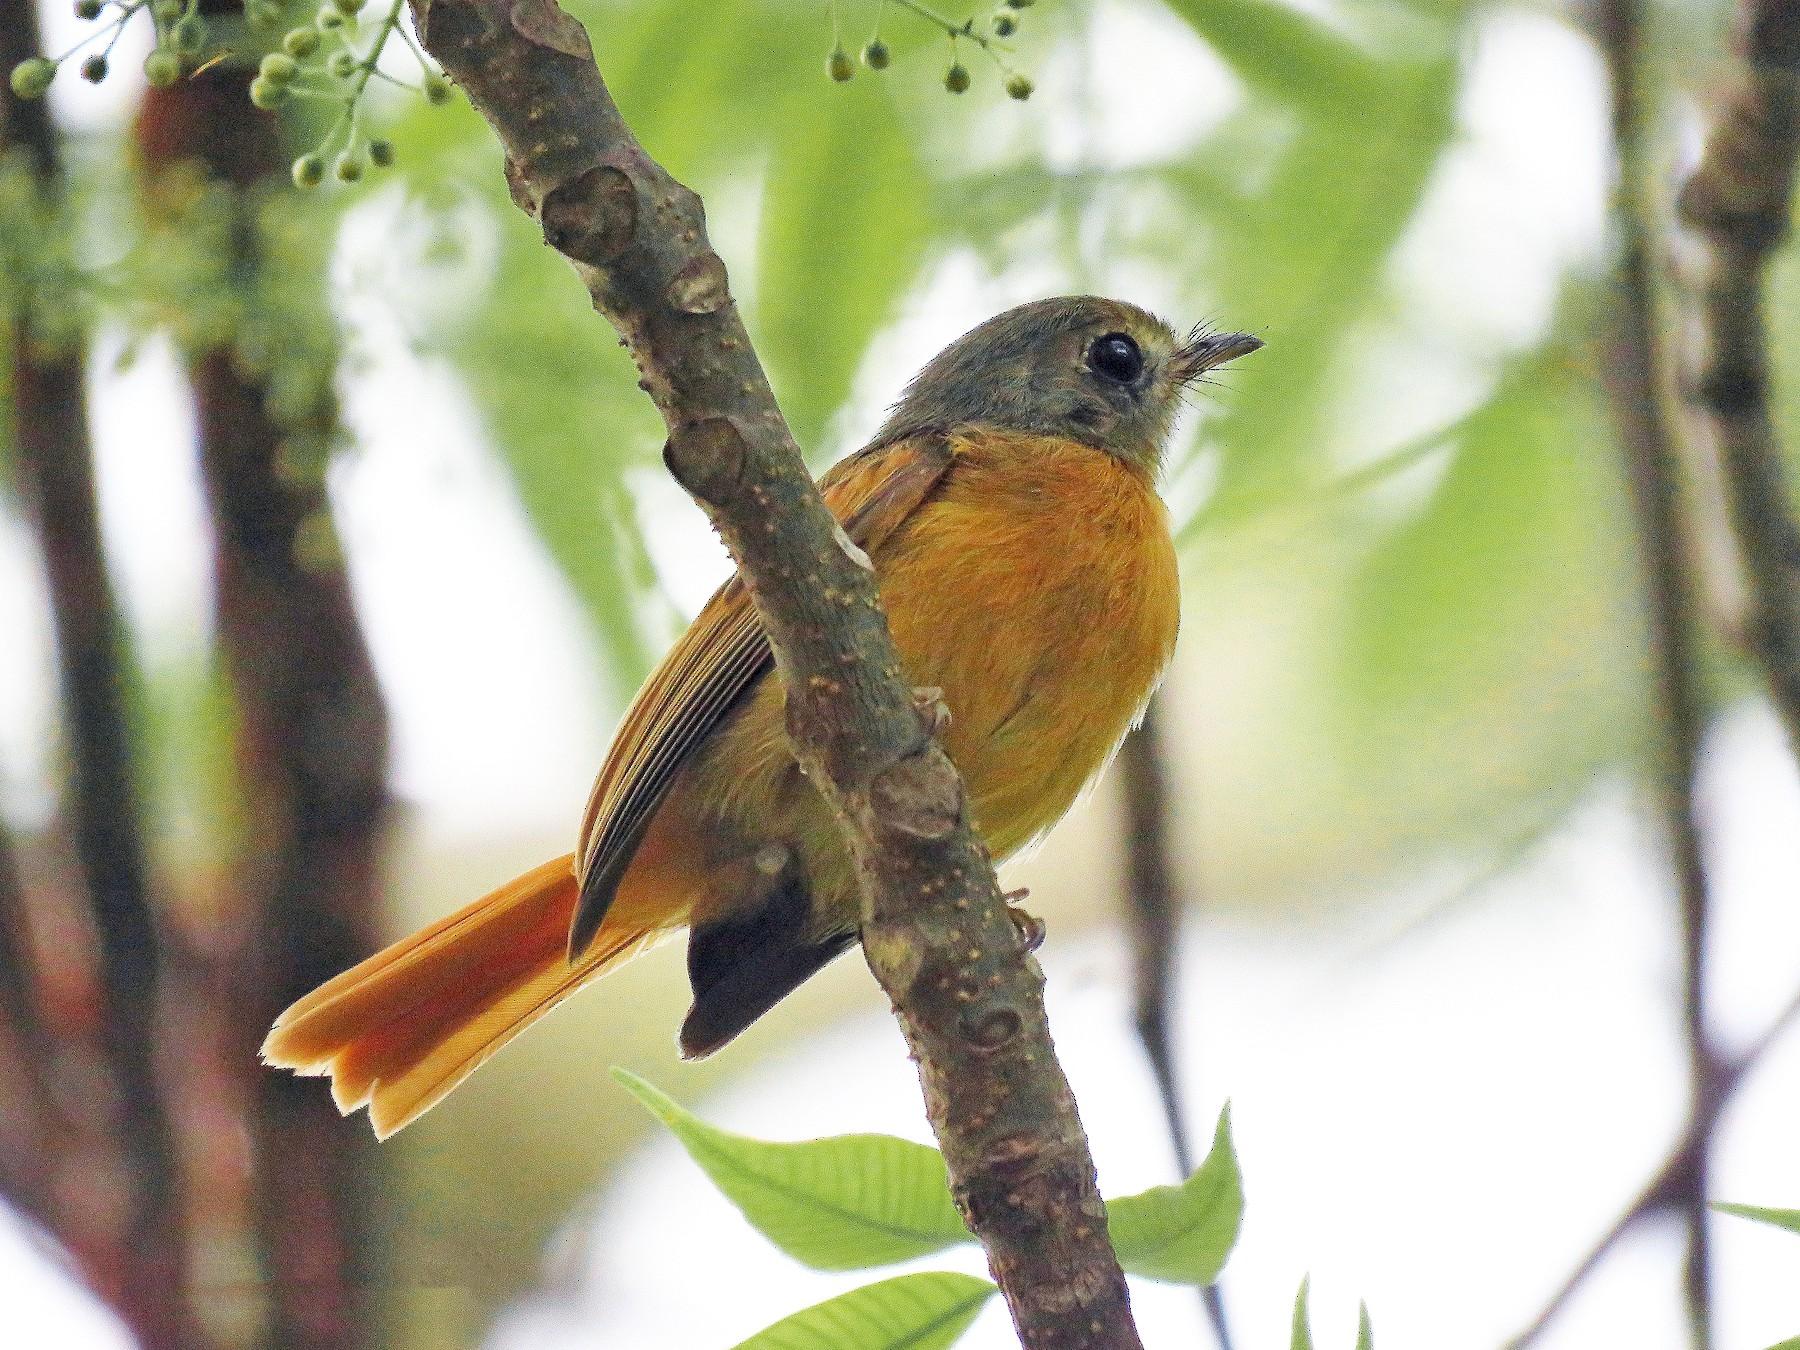 Ruddy-tailed Flycatcher - Rolando Jordan